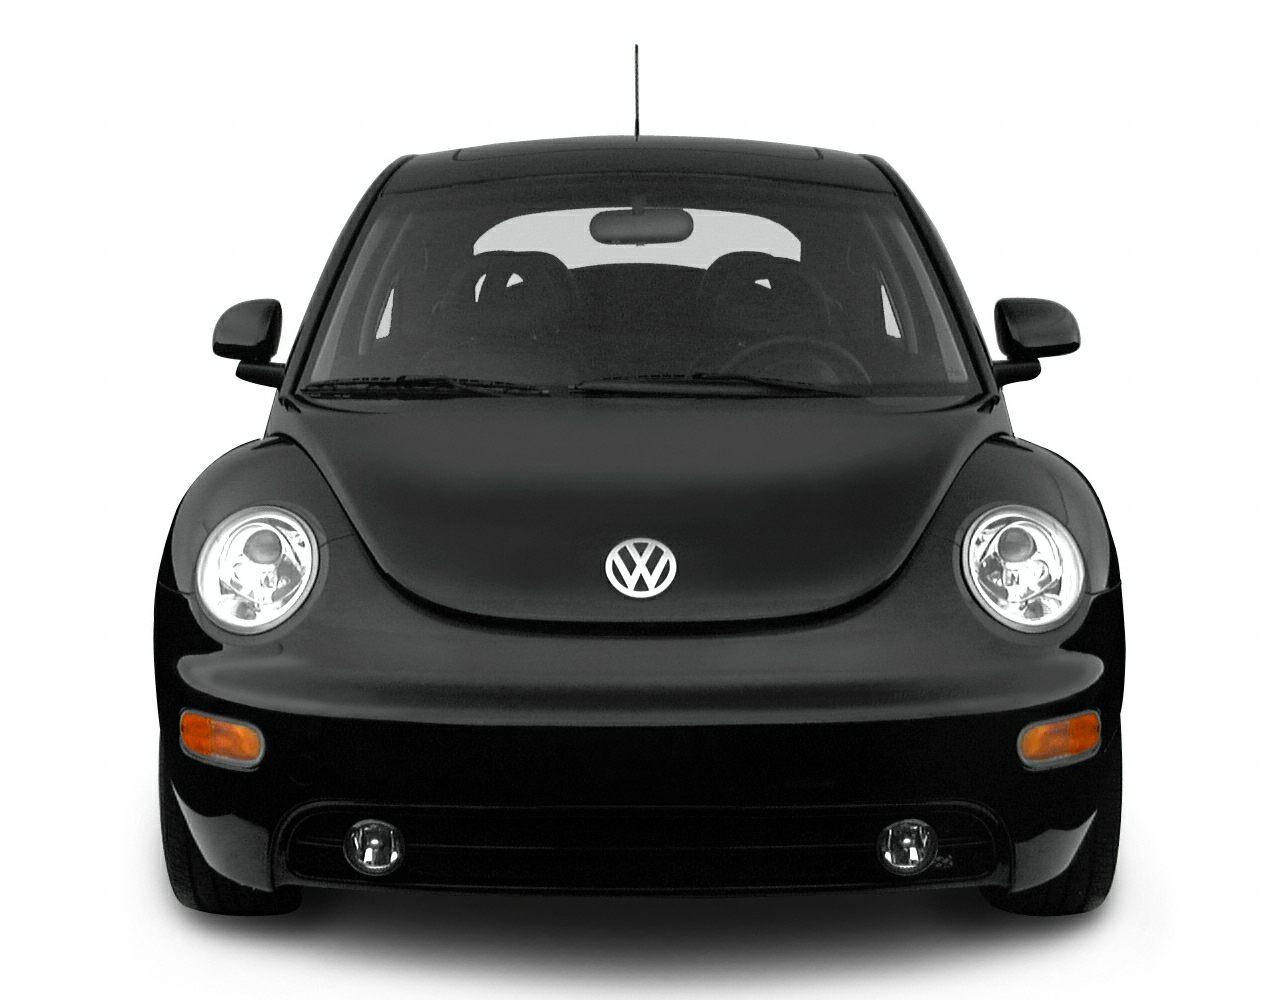 2000 Volkswagen New Beetle Gls Tdi 2dr Hatchback Pictures